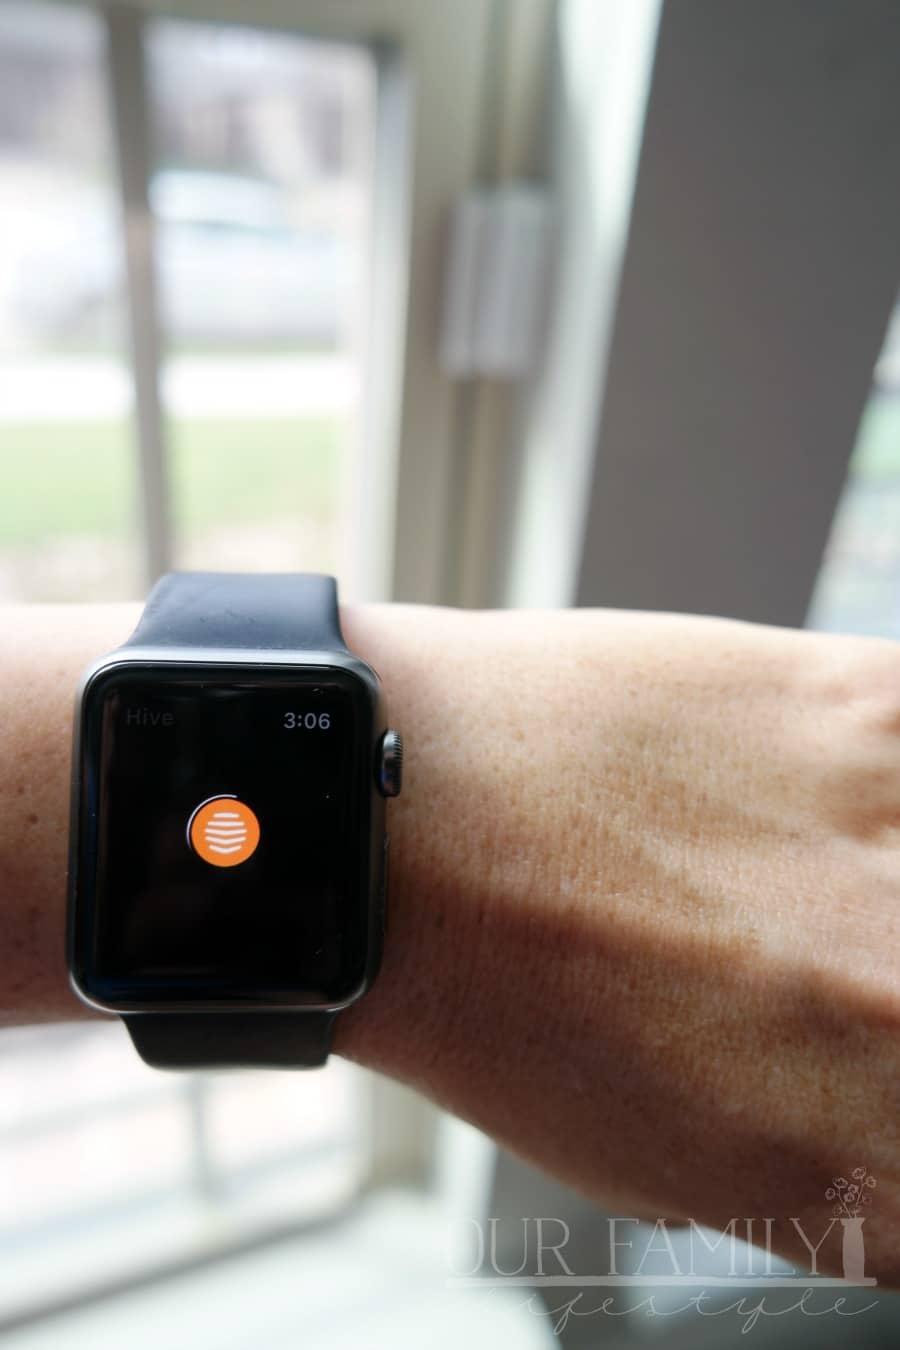 Hive Apple Watch App